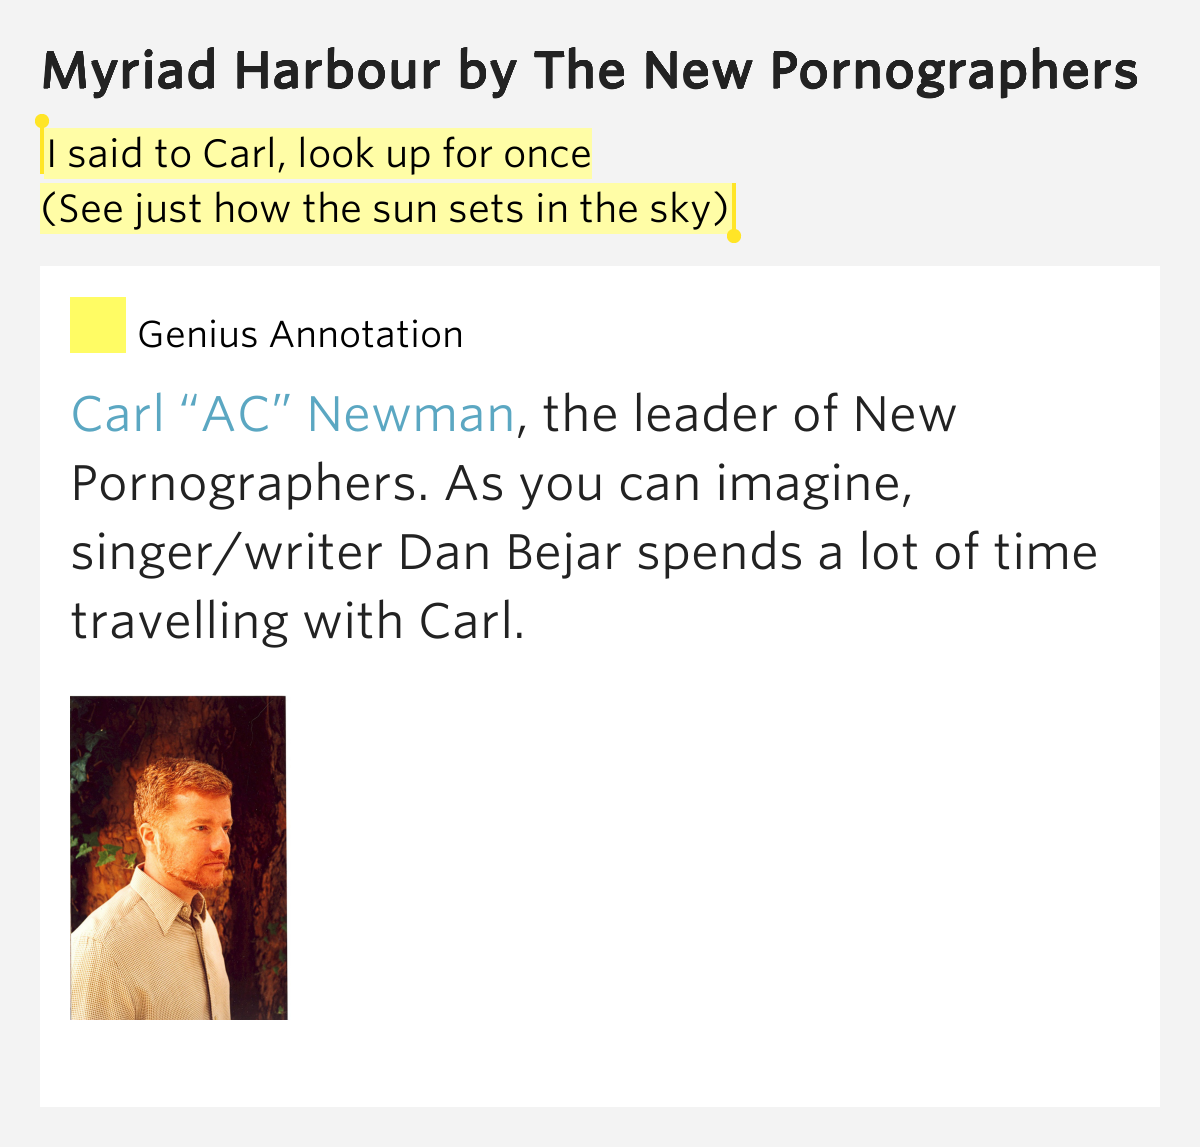 The new pornographers myriad harbor